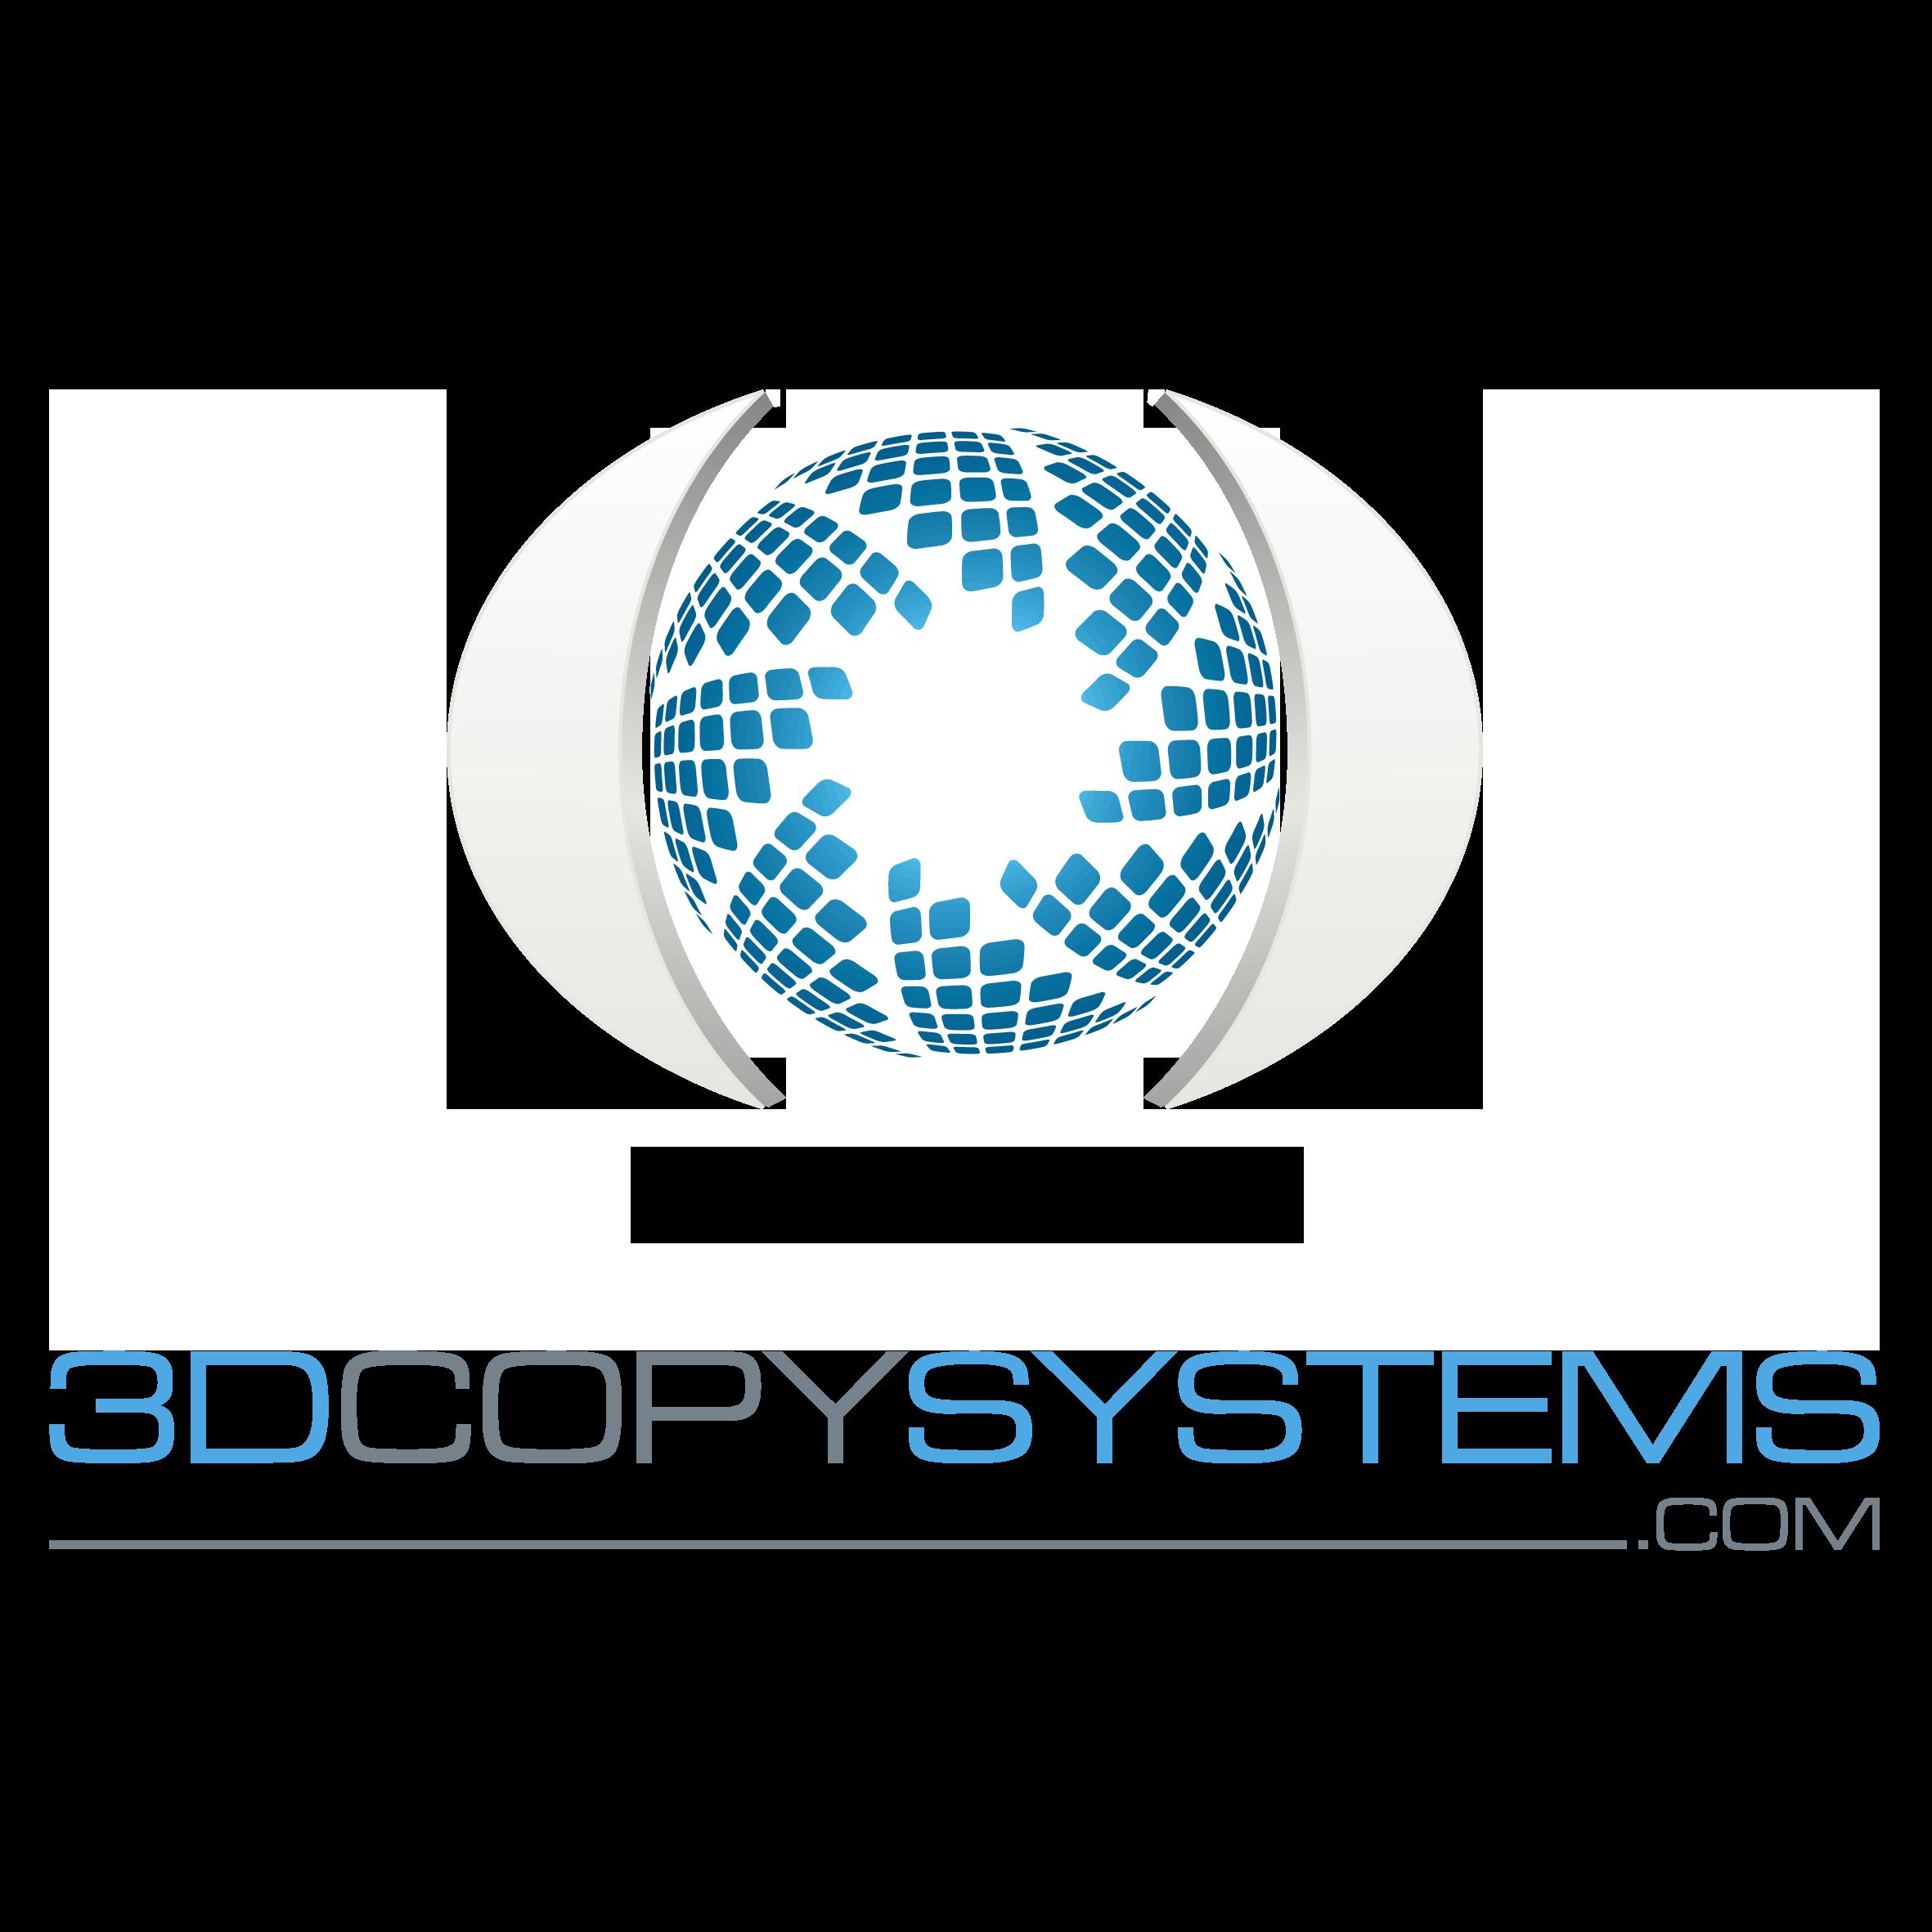 3Dcopysystems (RGB).png